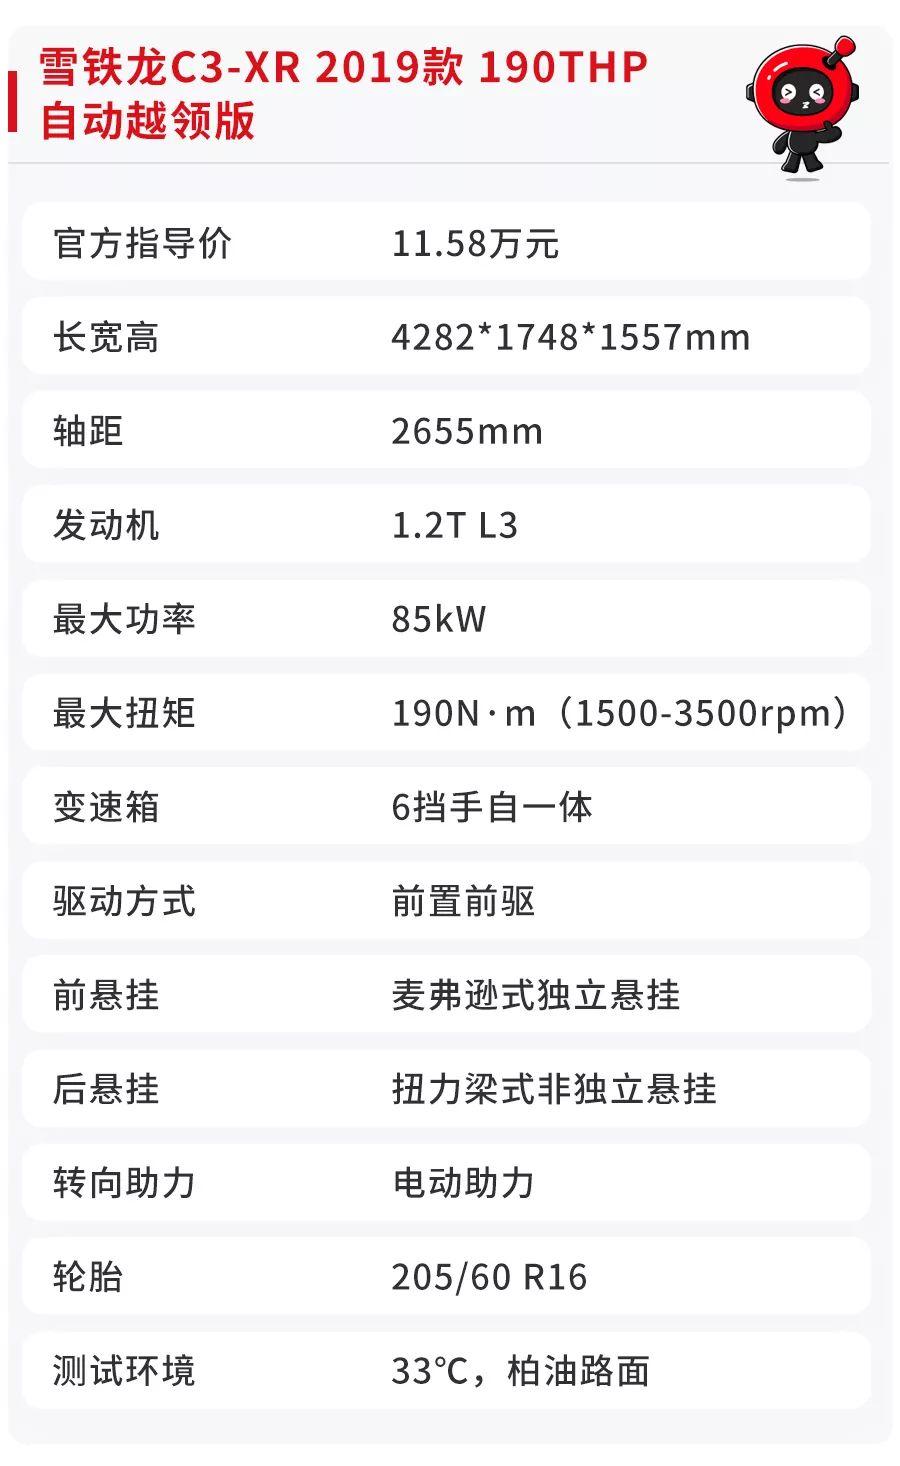 5.32L/100Km,这款高颜值SUV真实油耗曝光,90后买车首选